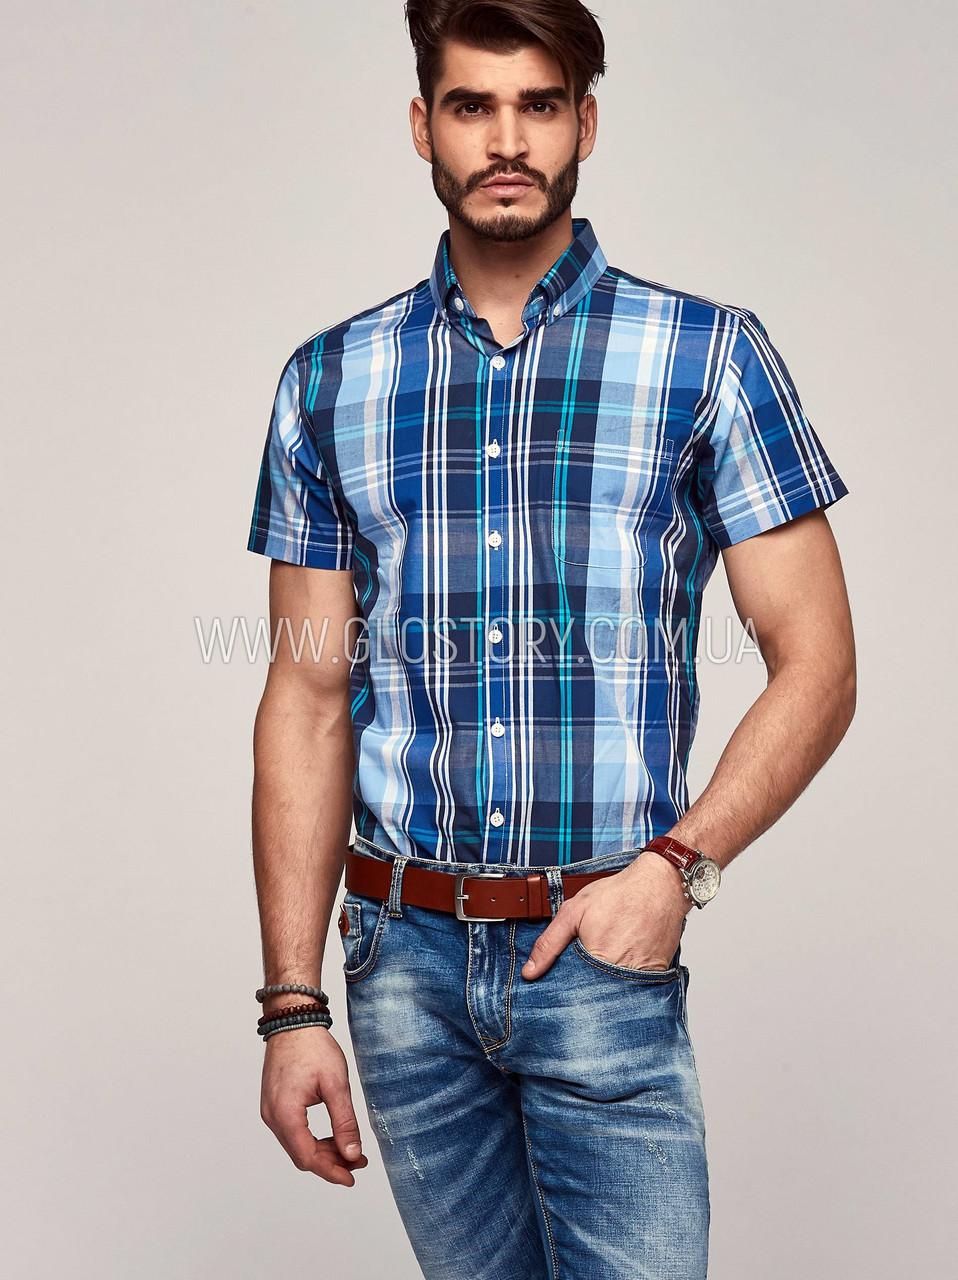 Мужская рубашка Glo-story, Венгрия